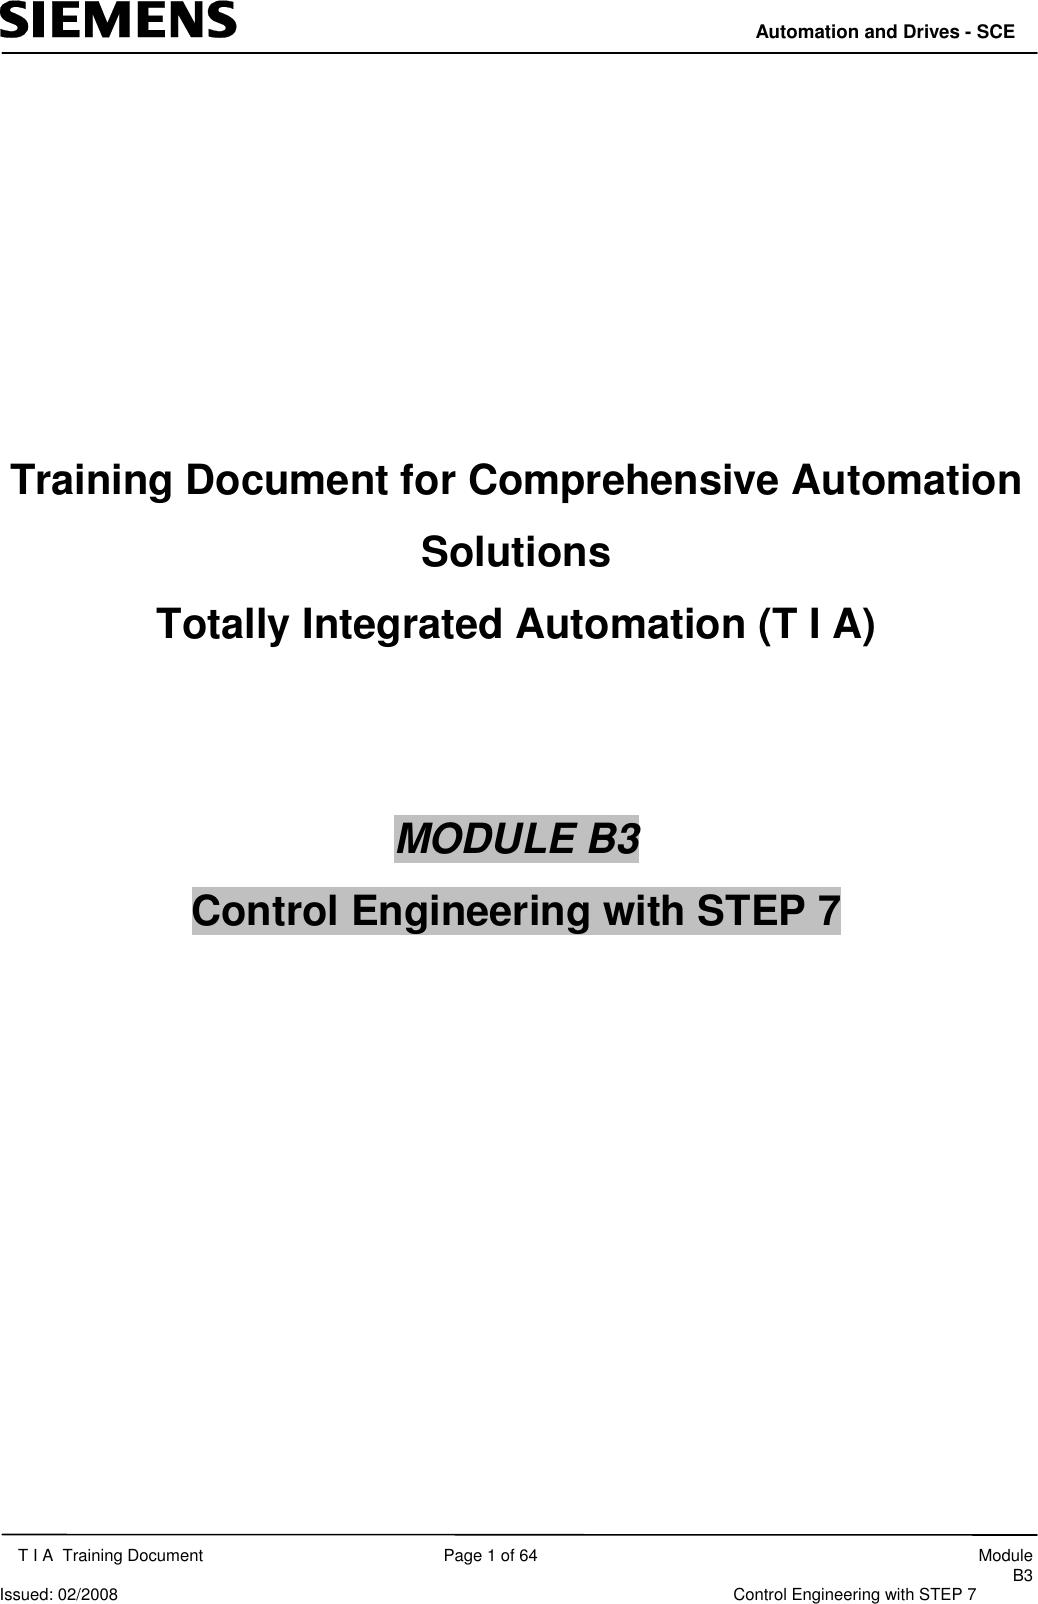 Siemens Time Clock Module B3 Users Manual Modul_B03